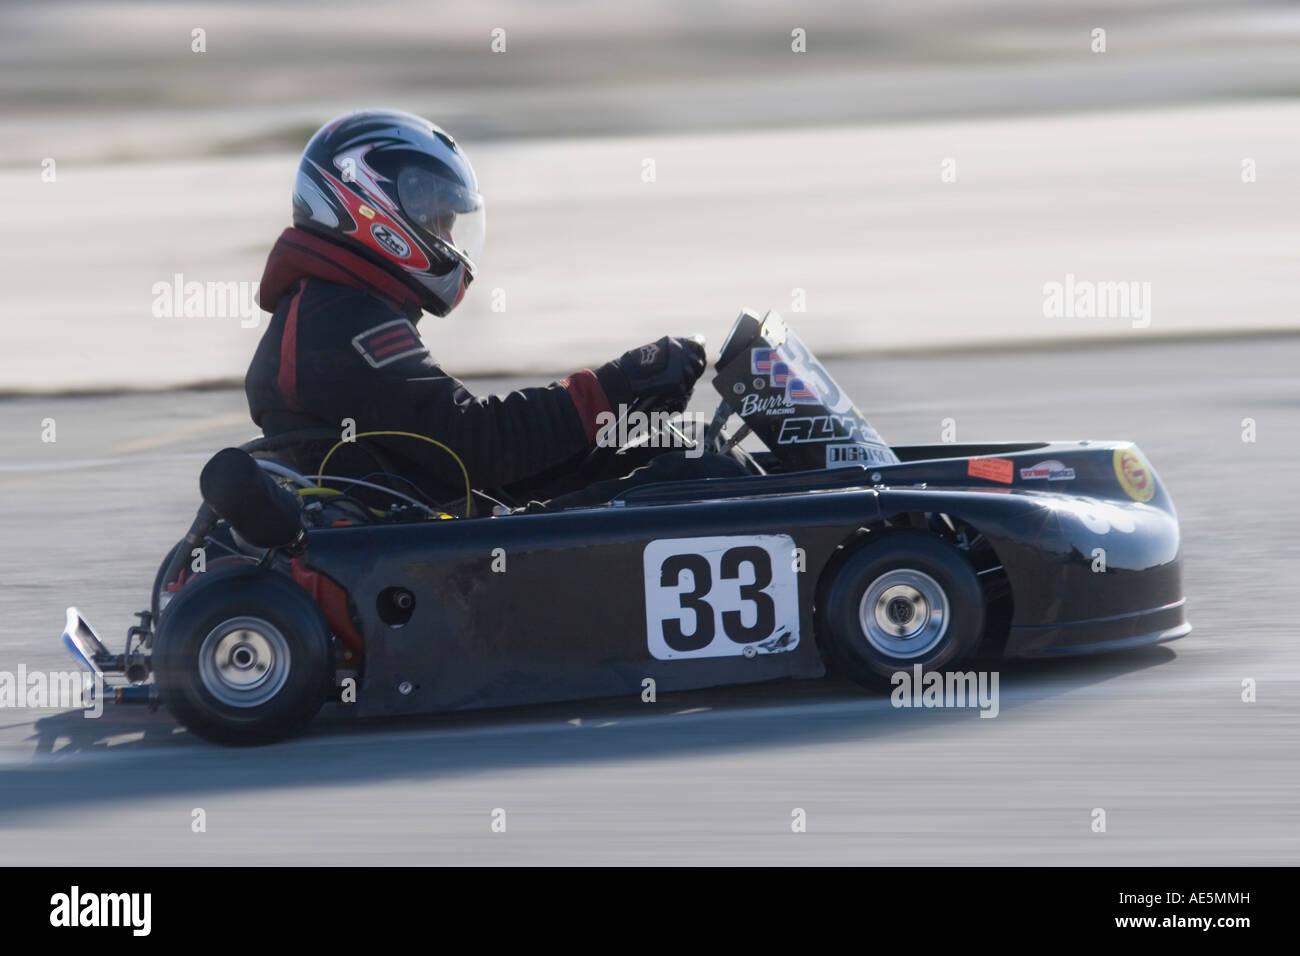 Go kart racer in kart number 33 whizzing by on an asphalt track - Stock Image